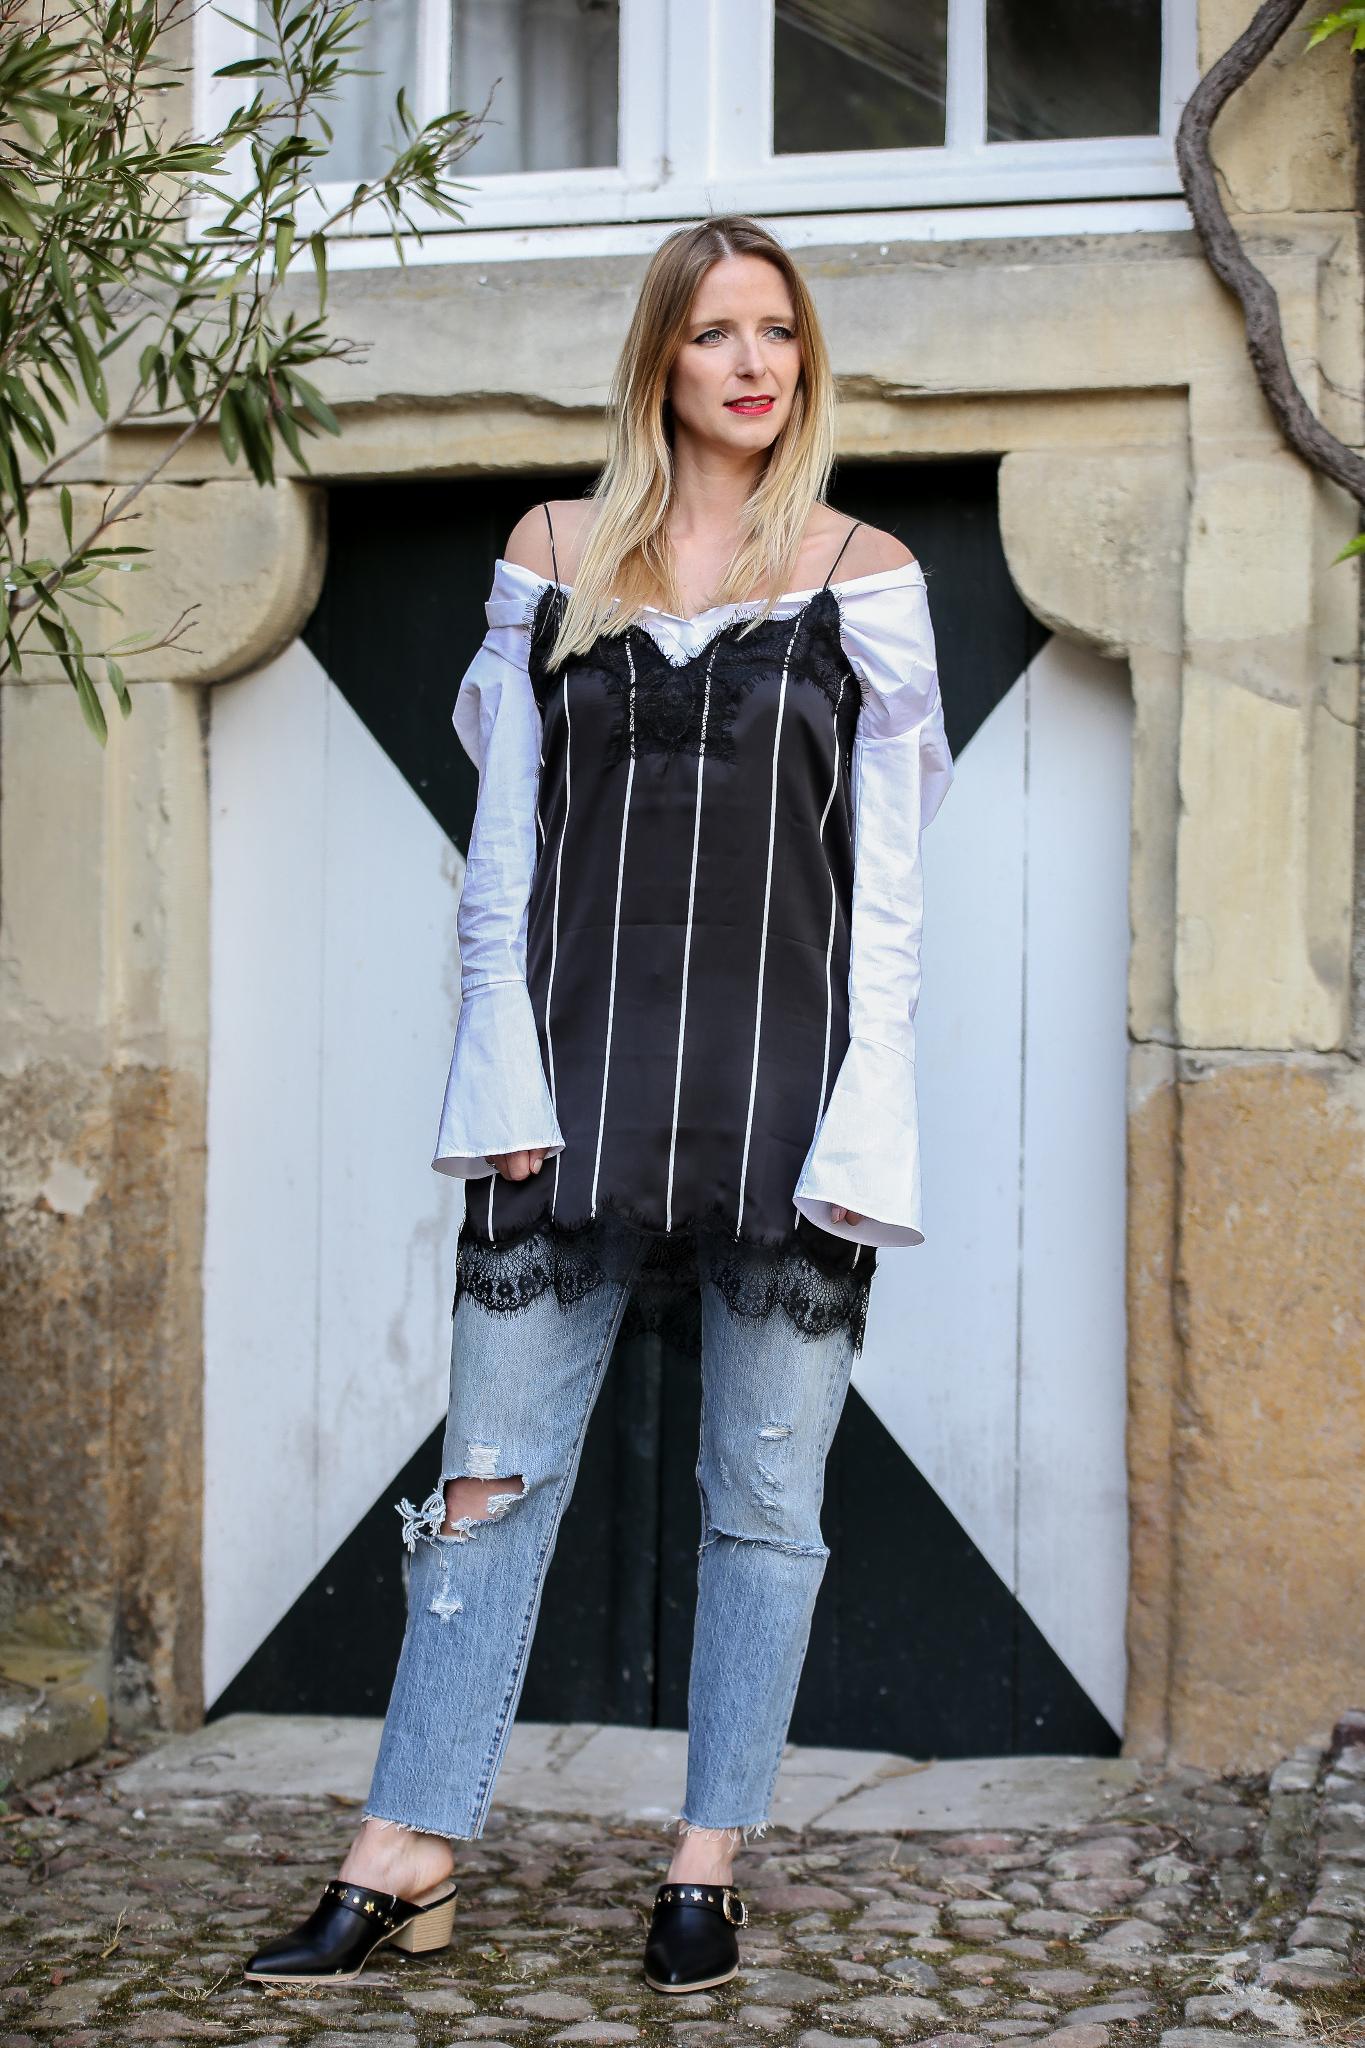 Fashion_Outfit_Off_Shoulder_Striped_Slipdress_MOD - by Monique